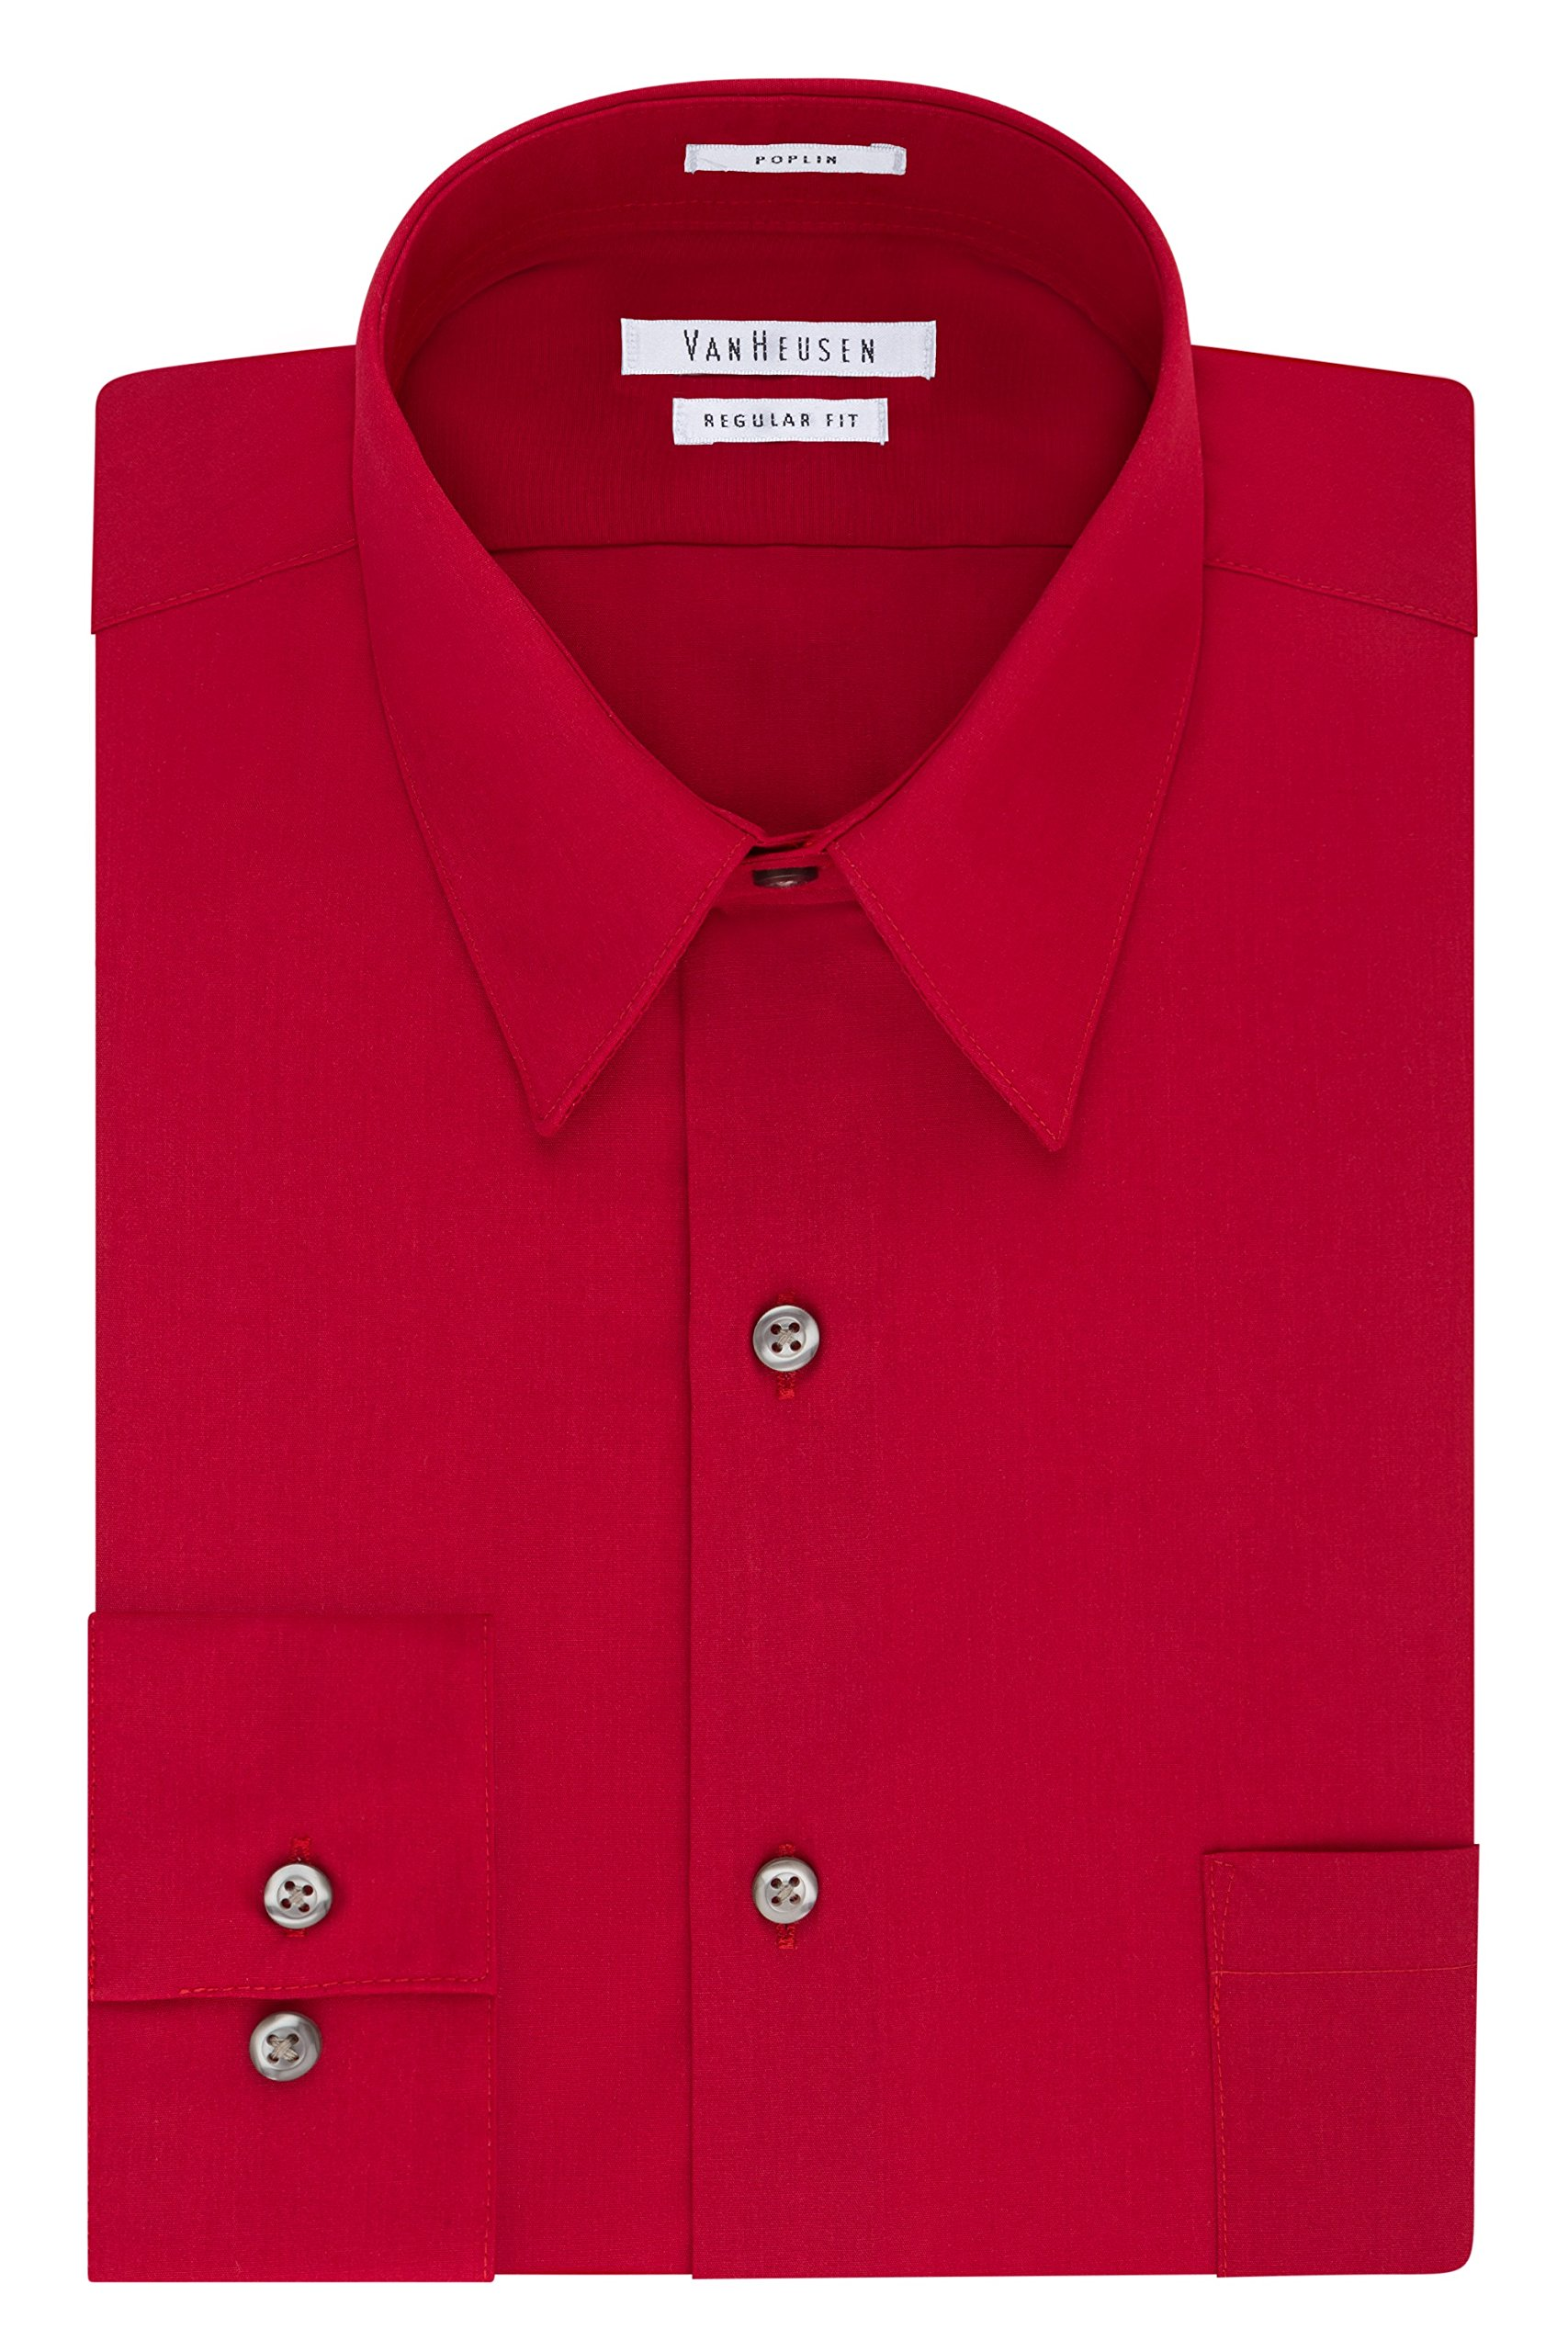 Van Heusen Men's Dress Shirt Regular Fit Poplin